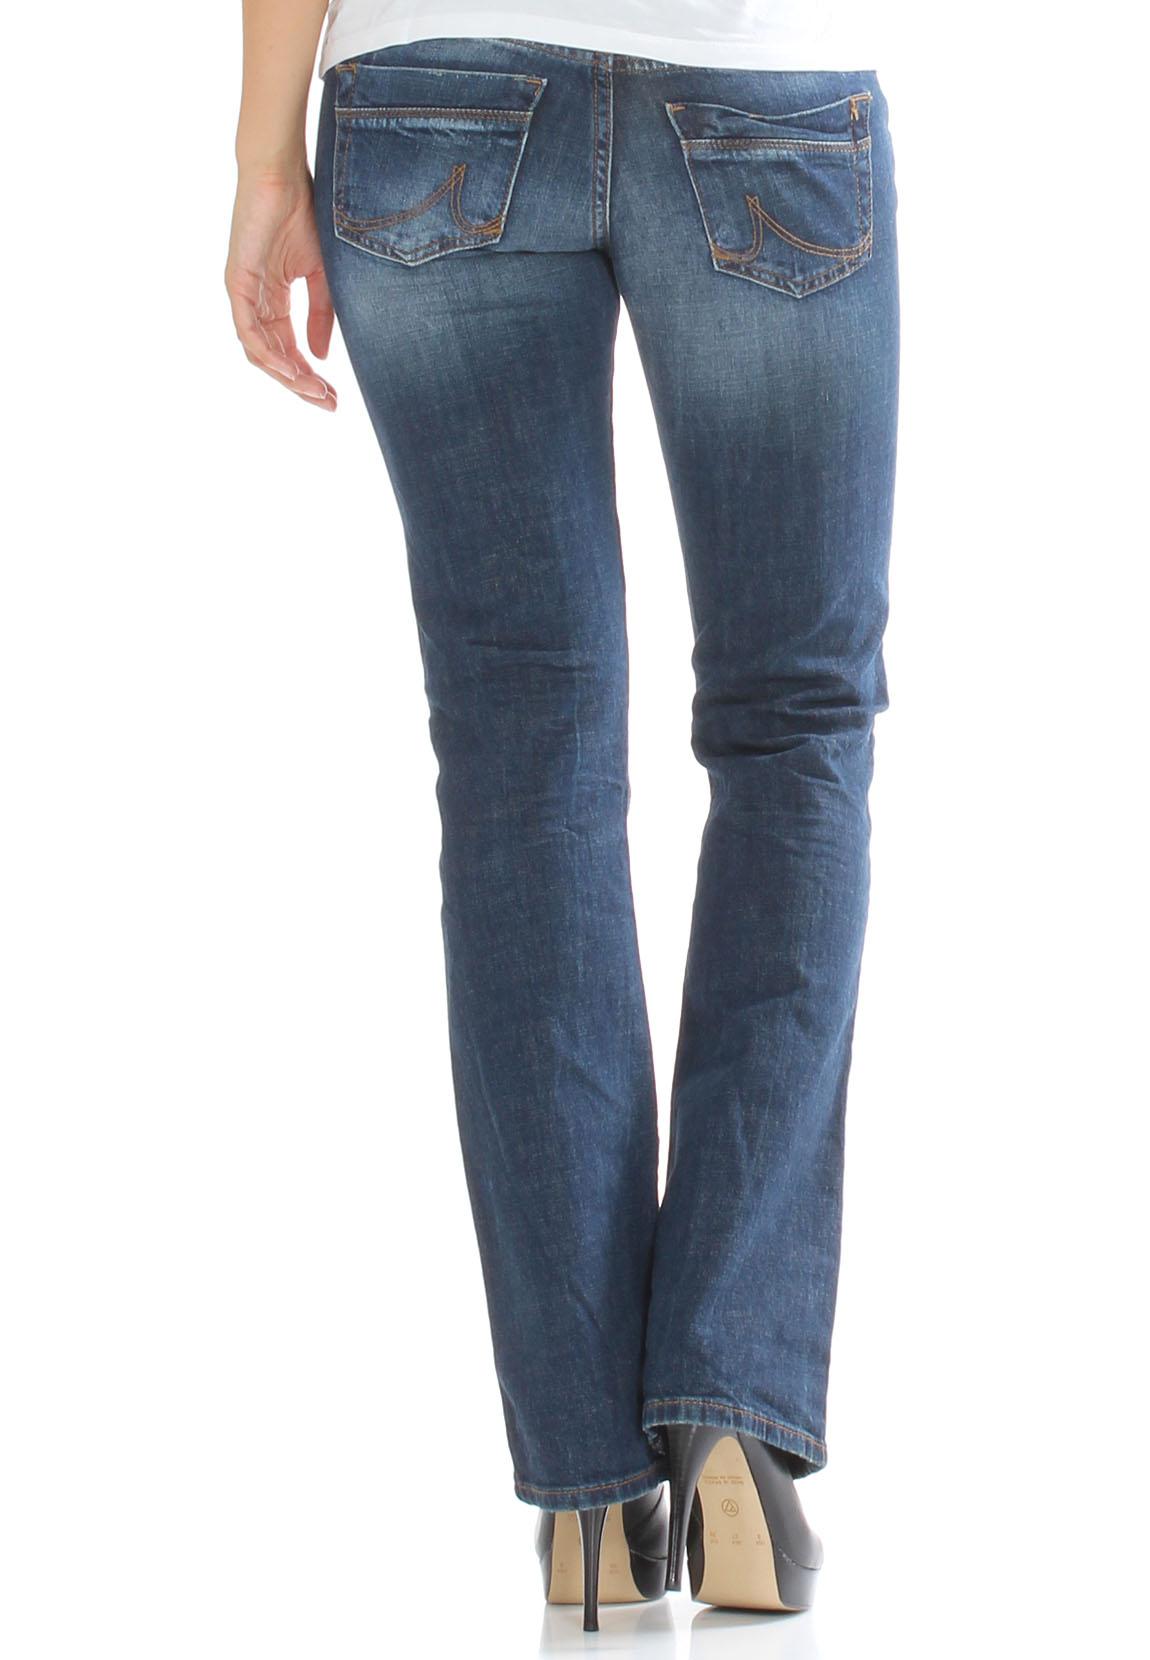 ltb jeans women valerie lasson wash damen jeans hosen. Black Bedroom Furniture Sets. Home Design Ideas